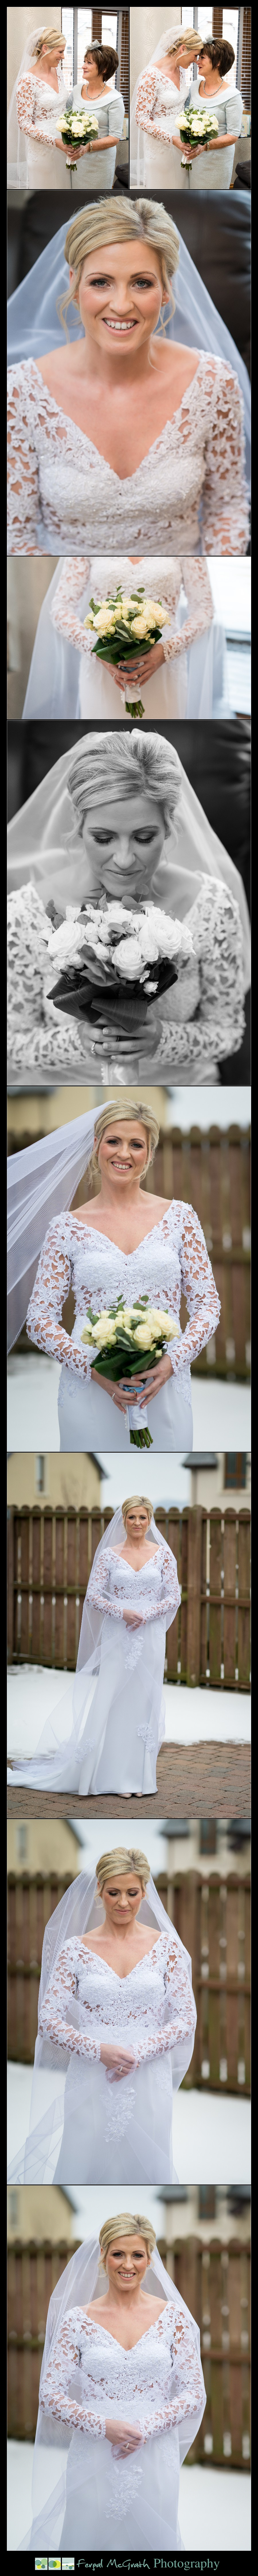 Great Northern Hotel Bundoran Winter Wedding stunning bride portraits